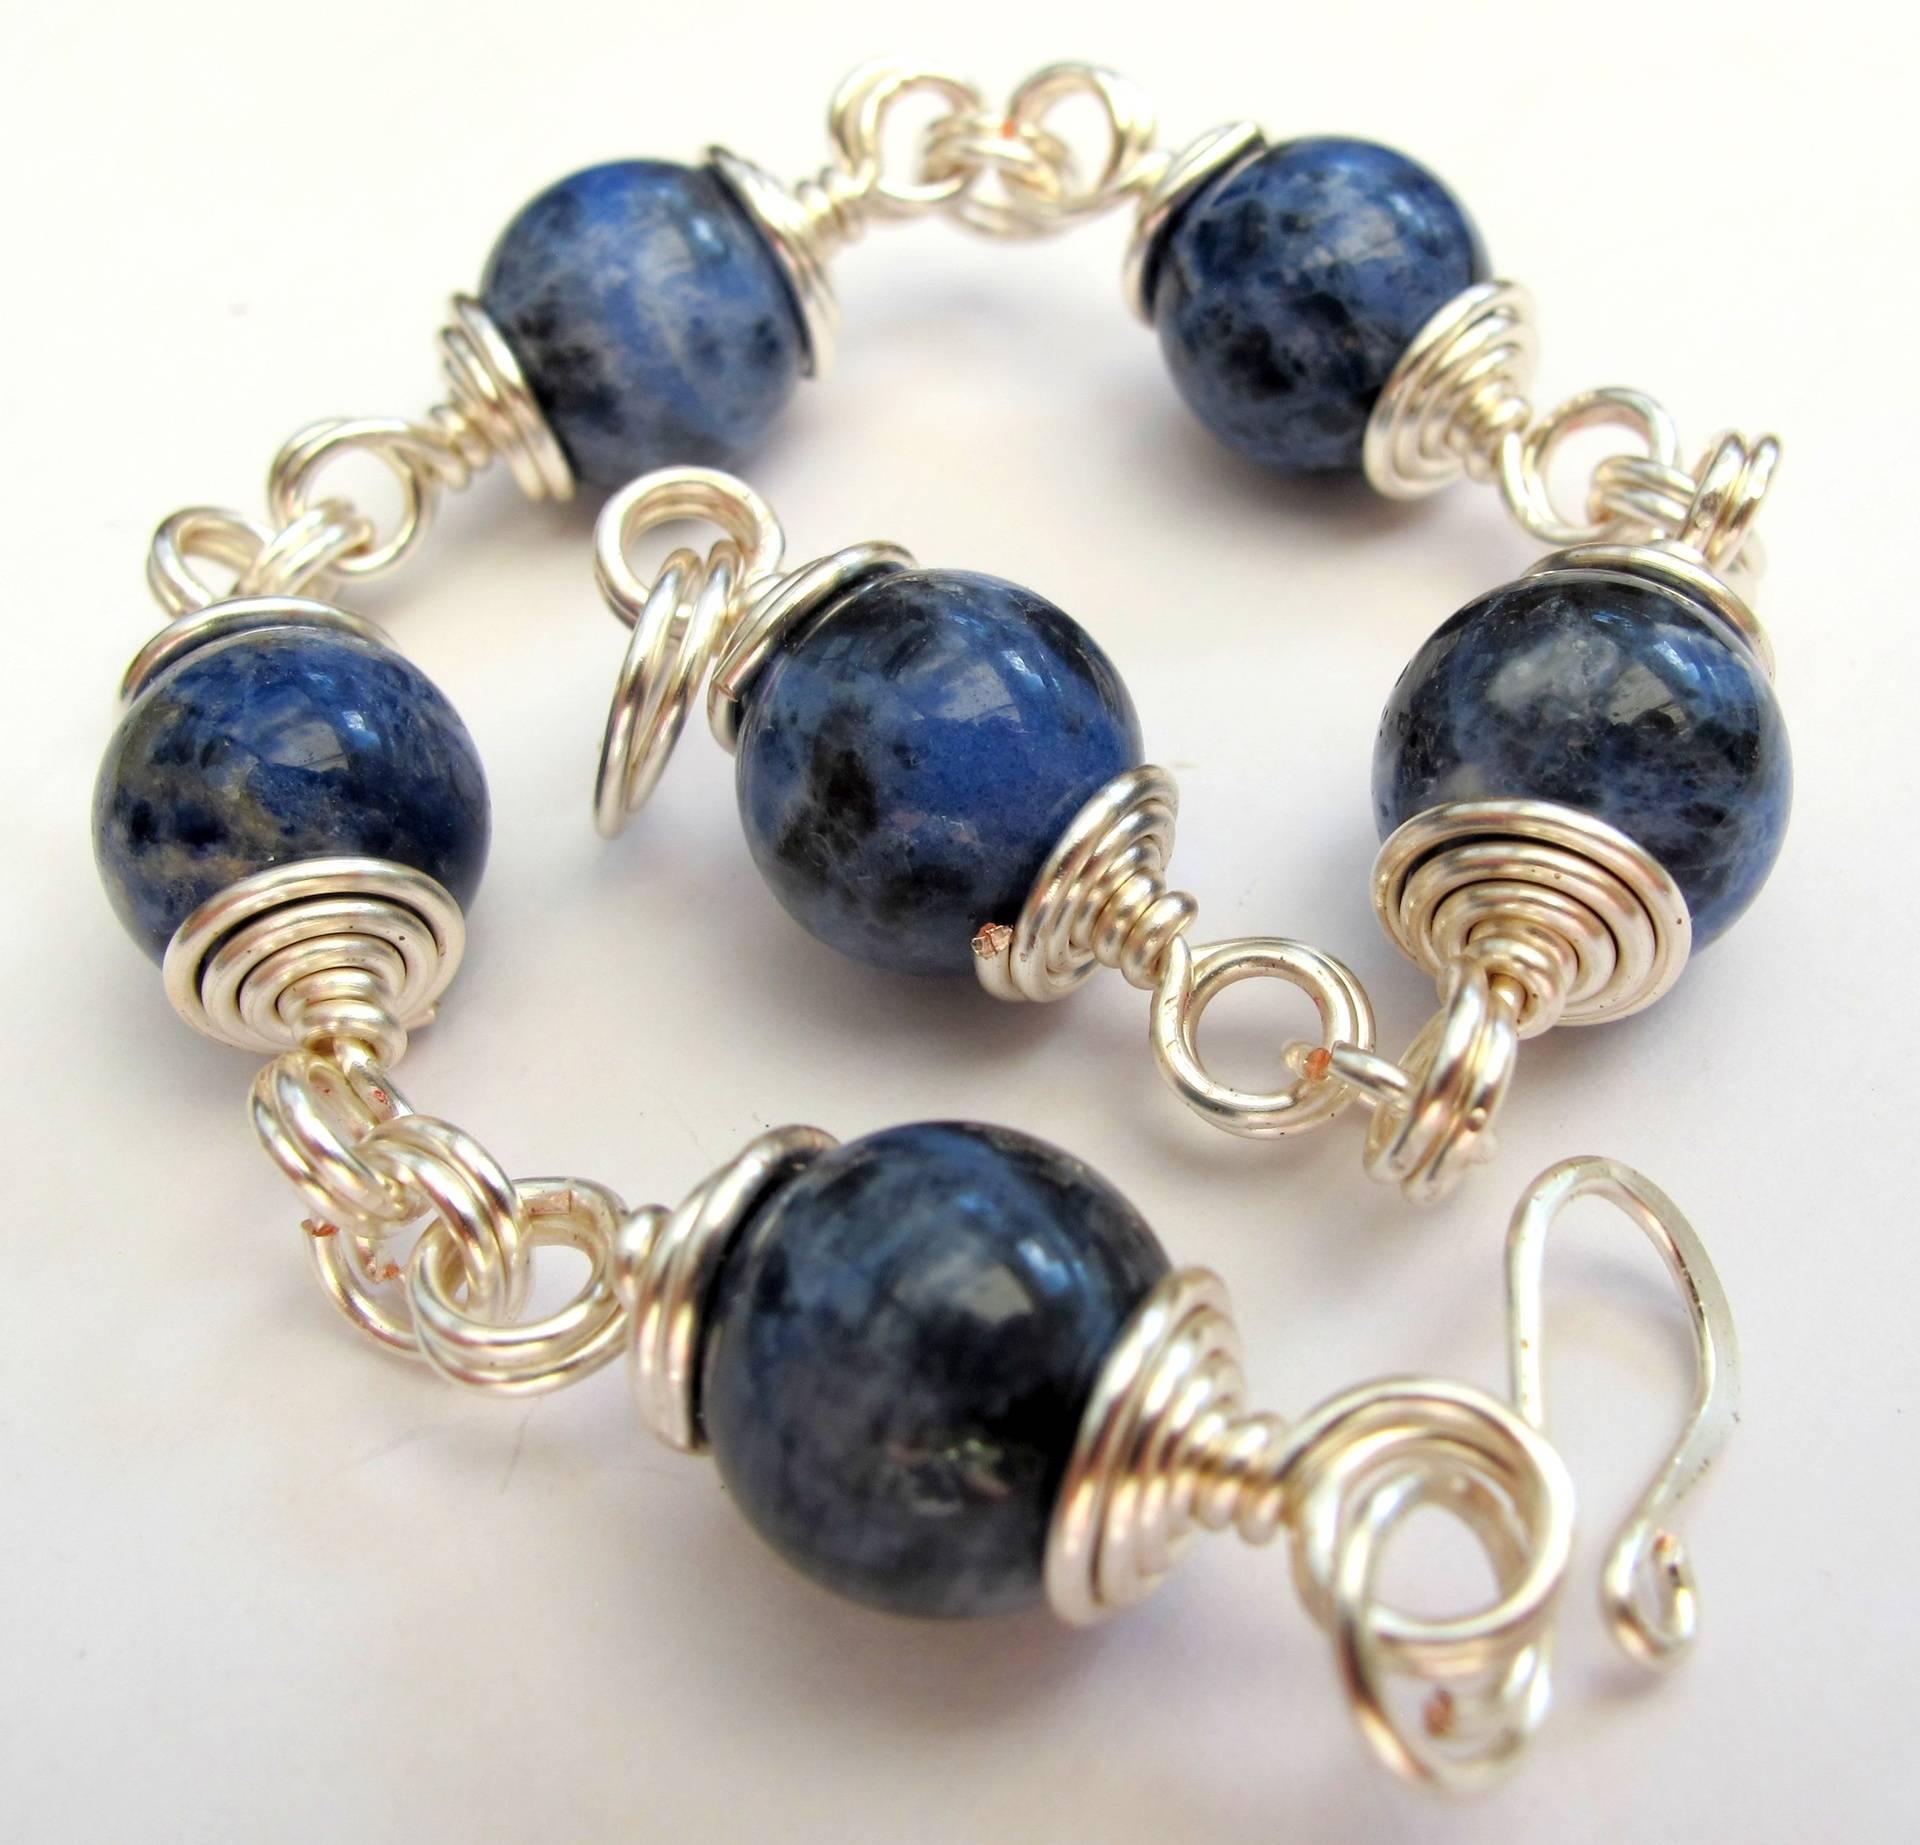 Wrapped Bead Bracelet